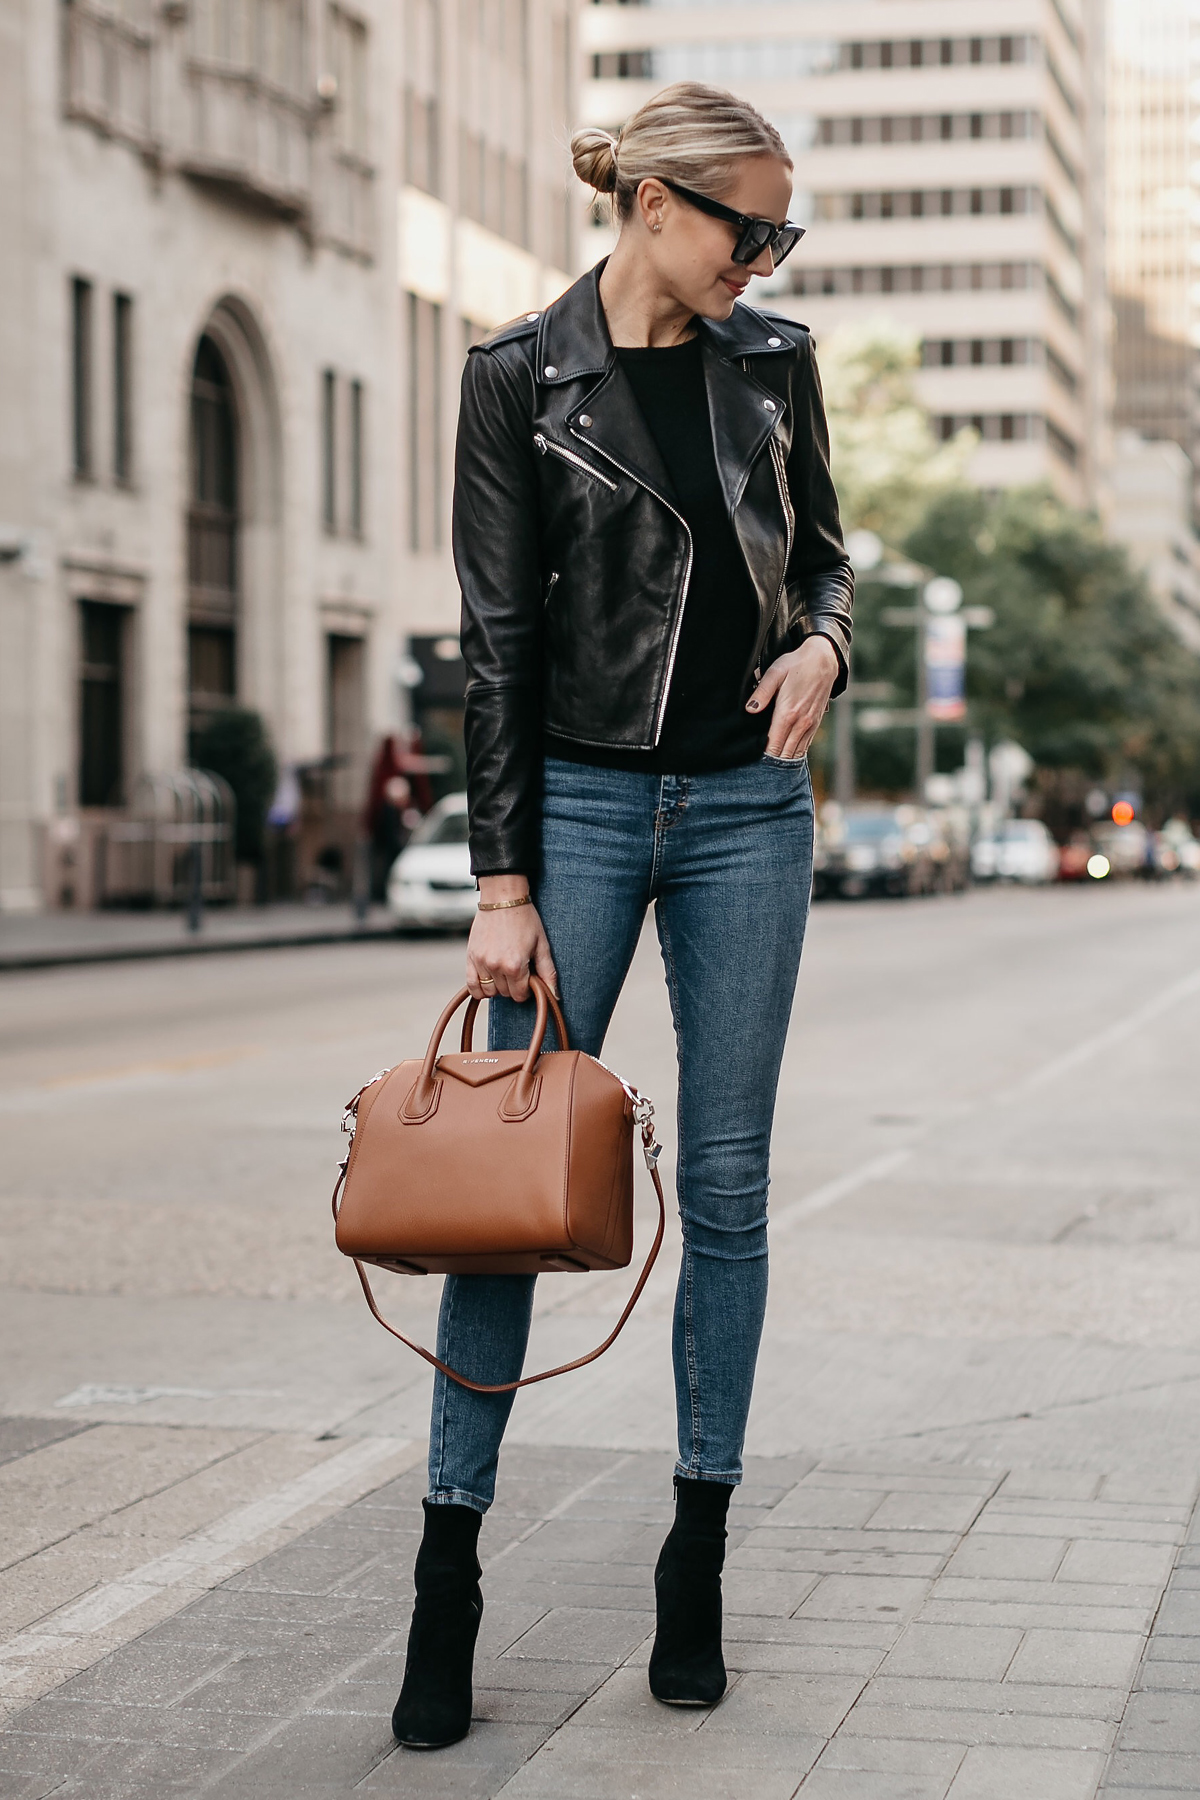 Blonde Woman Wearing Black Leather Jacket Denim Skinny Jeans Black Booties Givencny Antigona Cognac Satchel Fashion Jackson Dallas Blogger Fashion Blogger Street Style